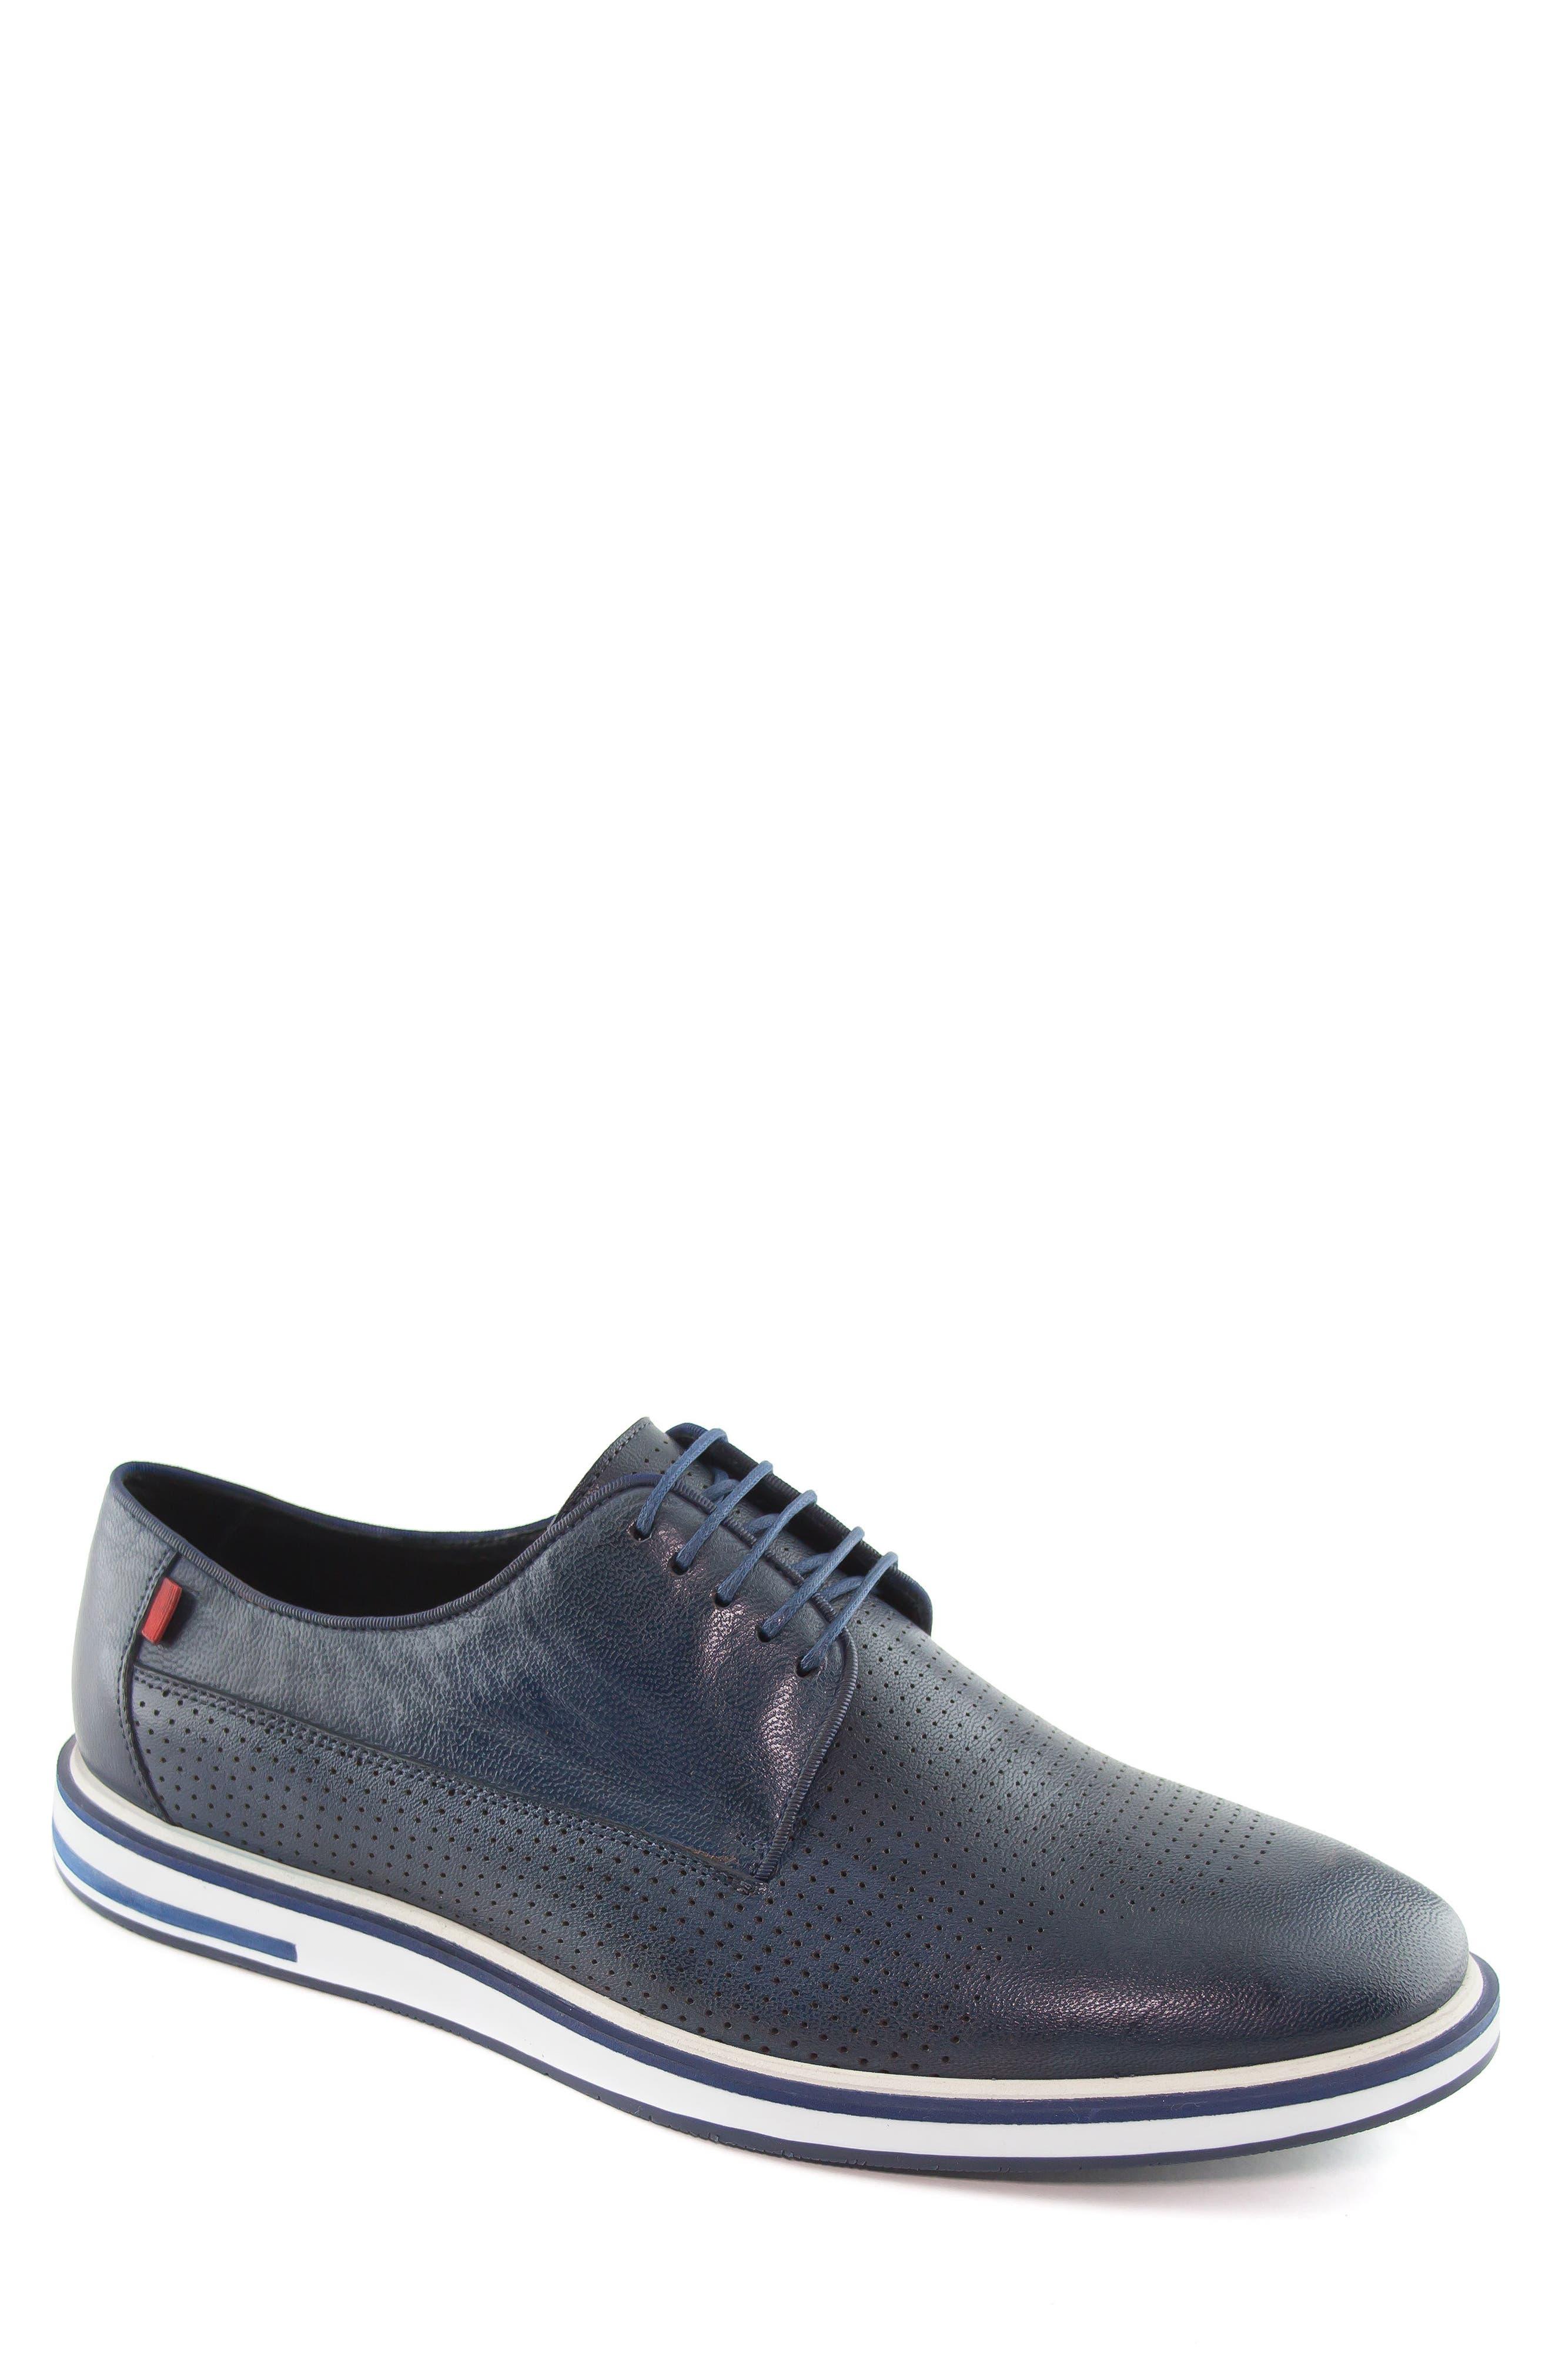 Manhattan Sneaker,                         Main,                         color, Navy